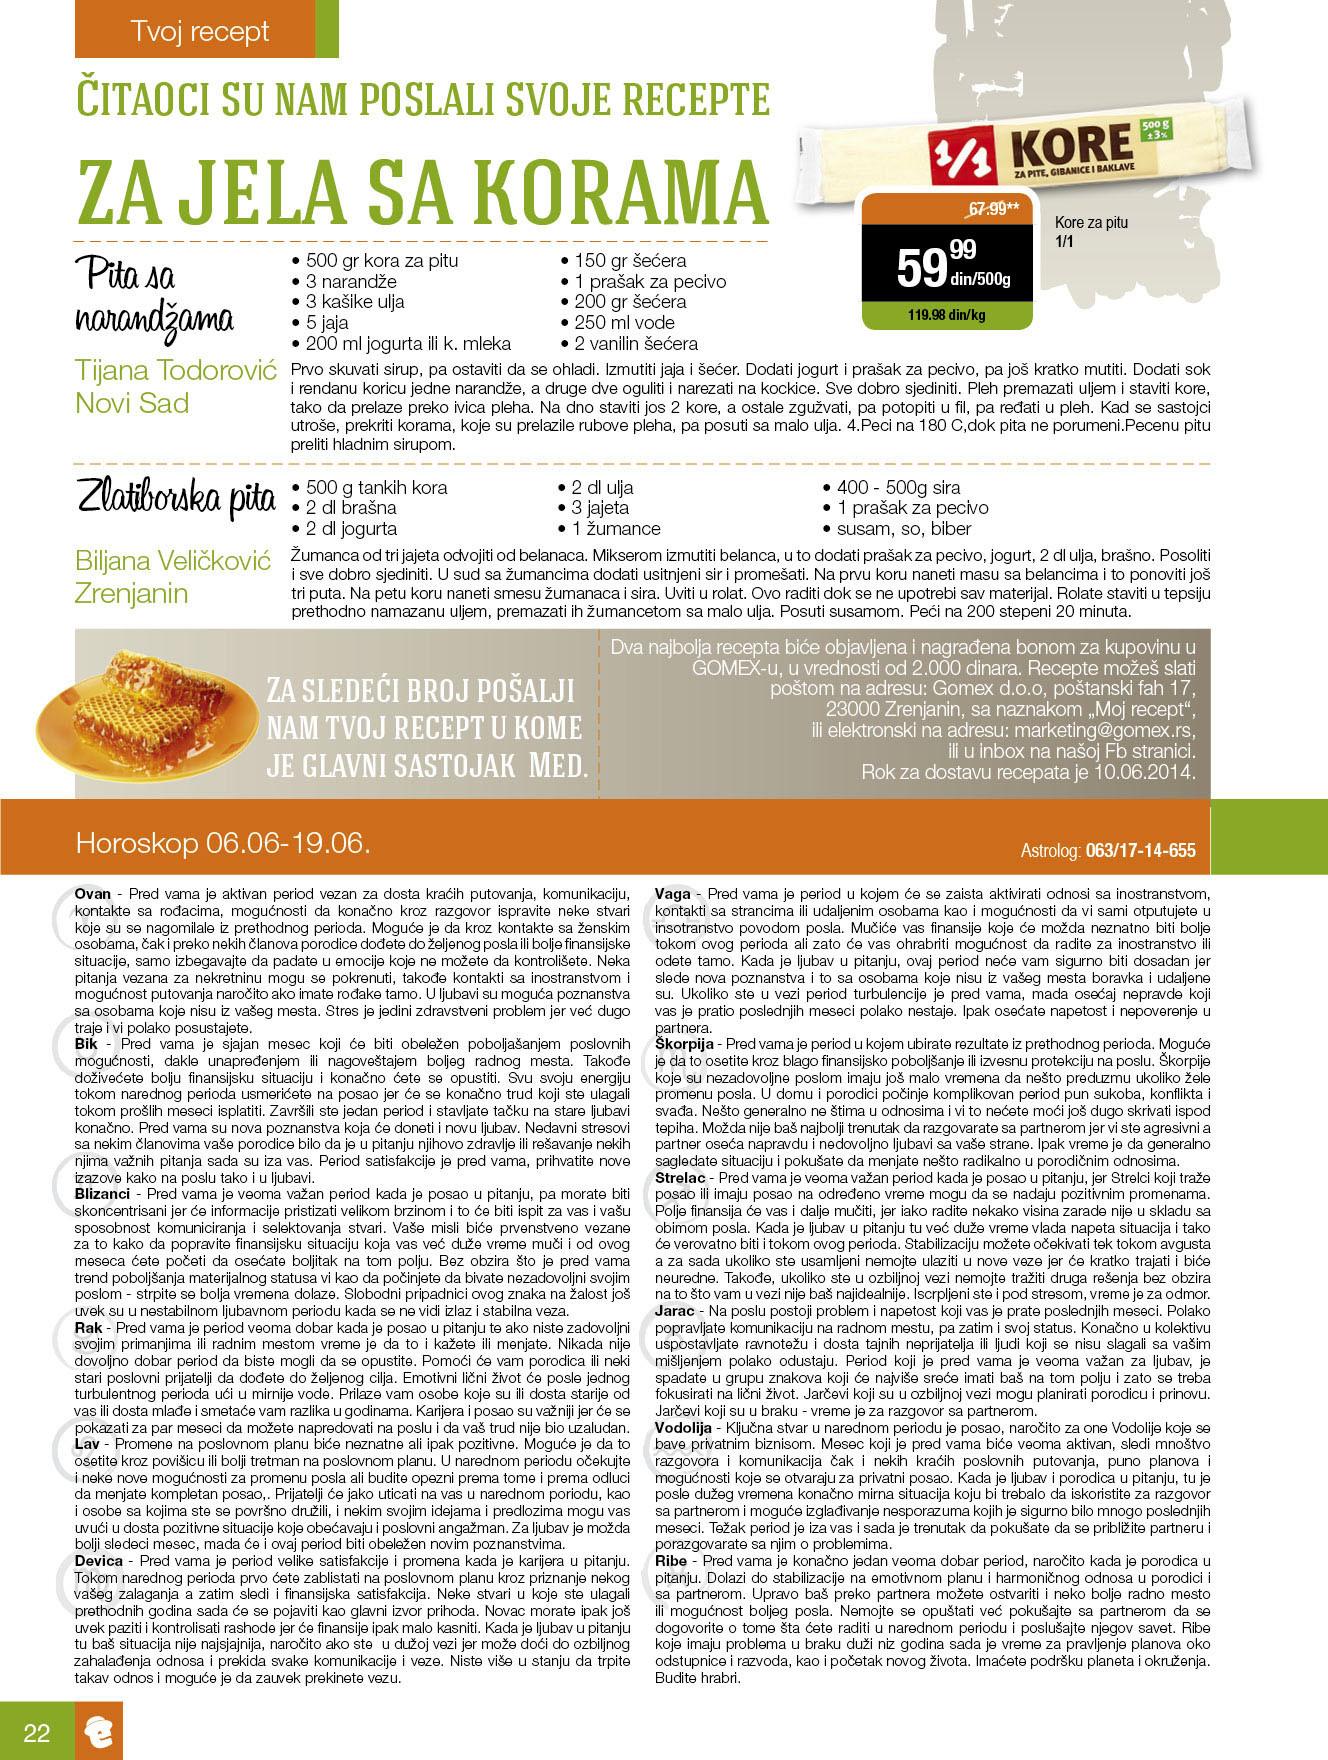 Gomex akcija porodični magazin niskih cena